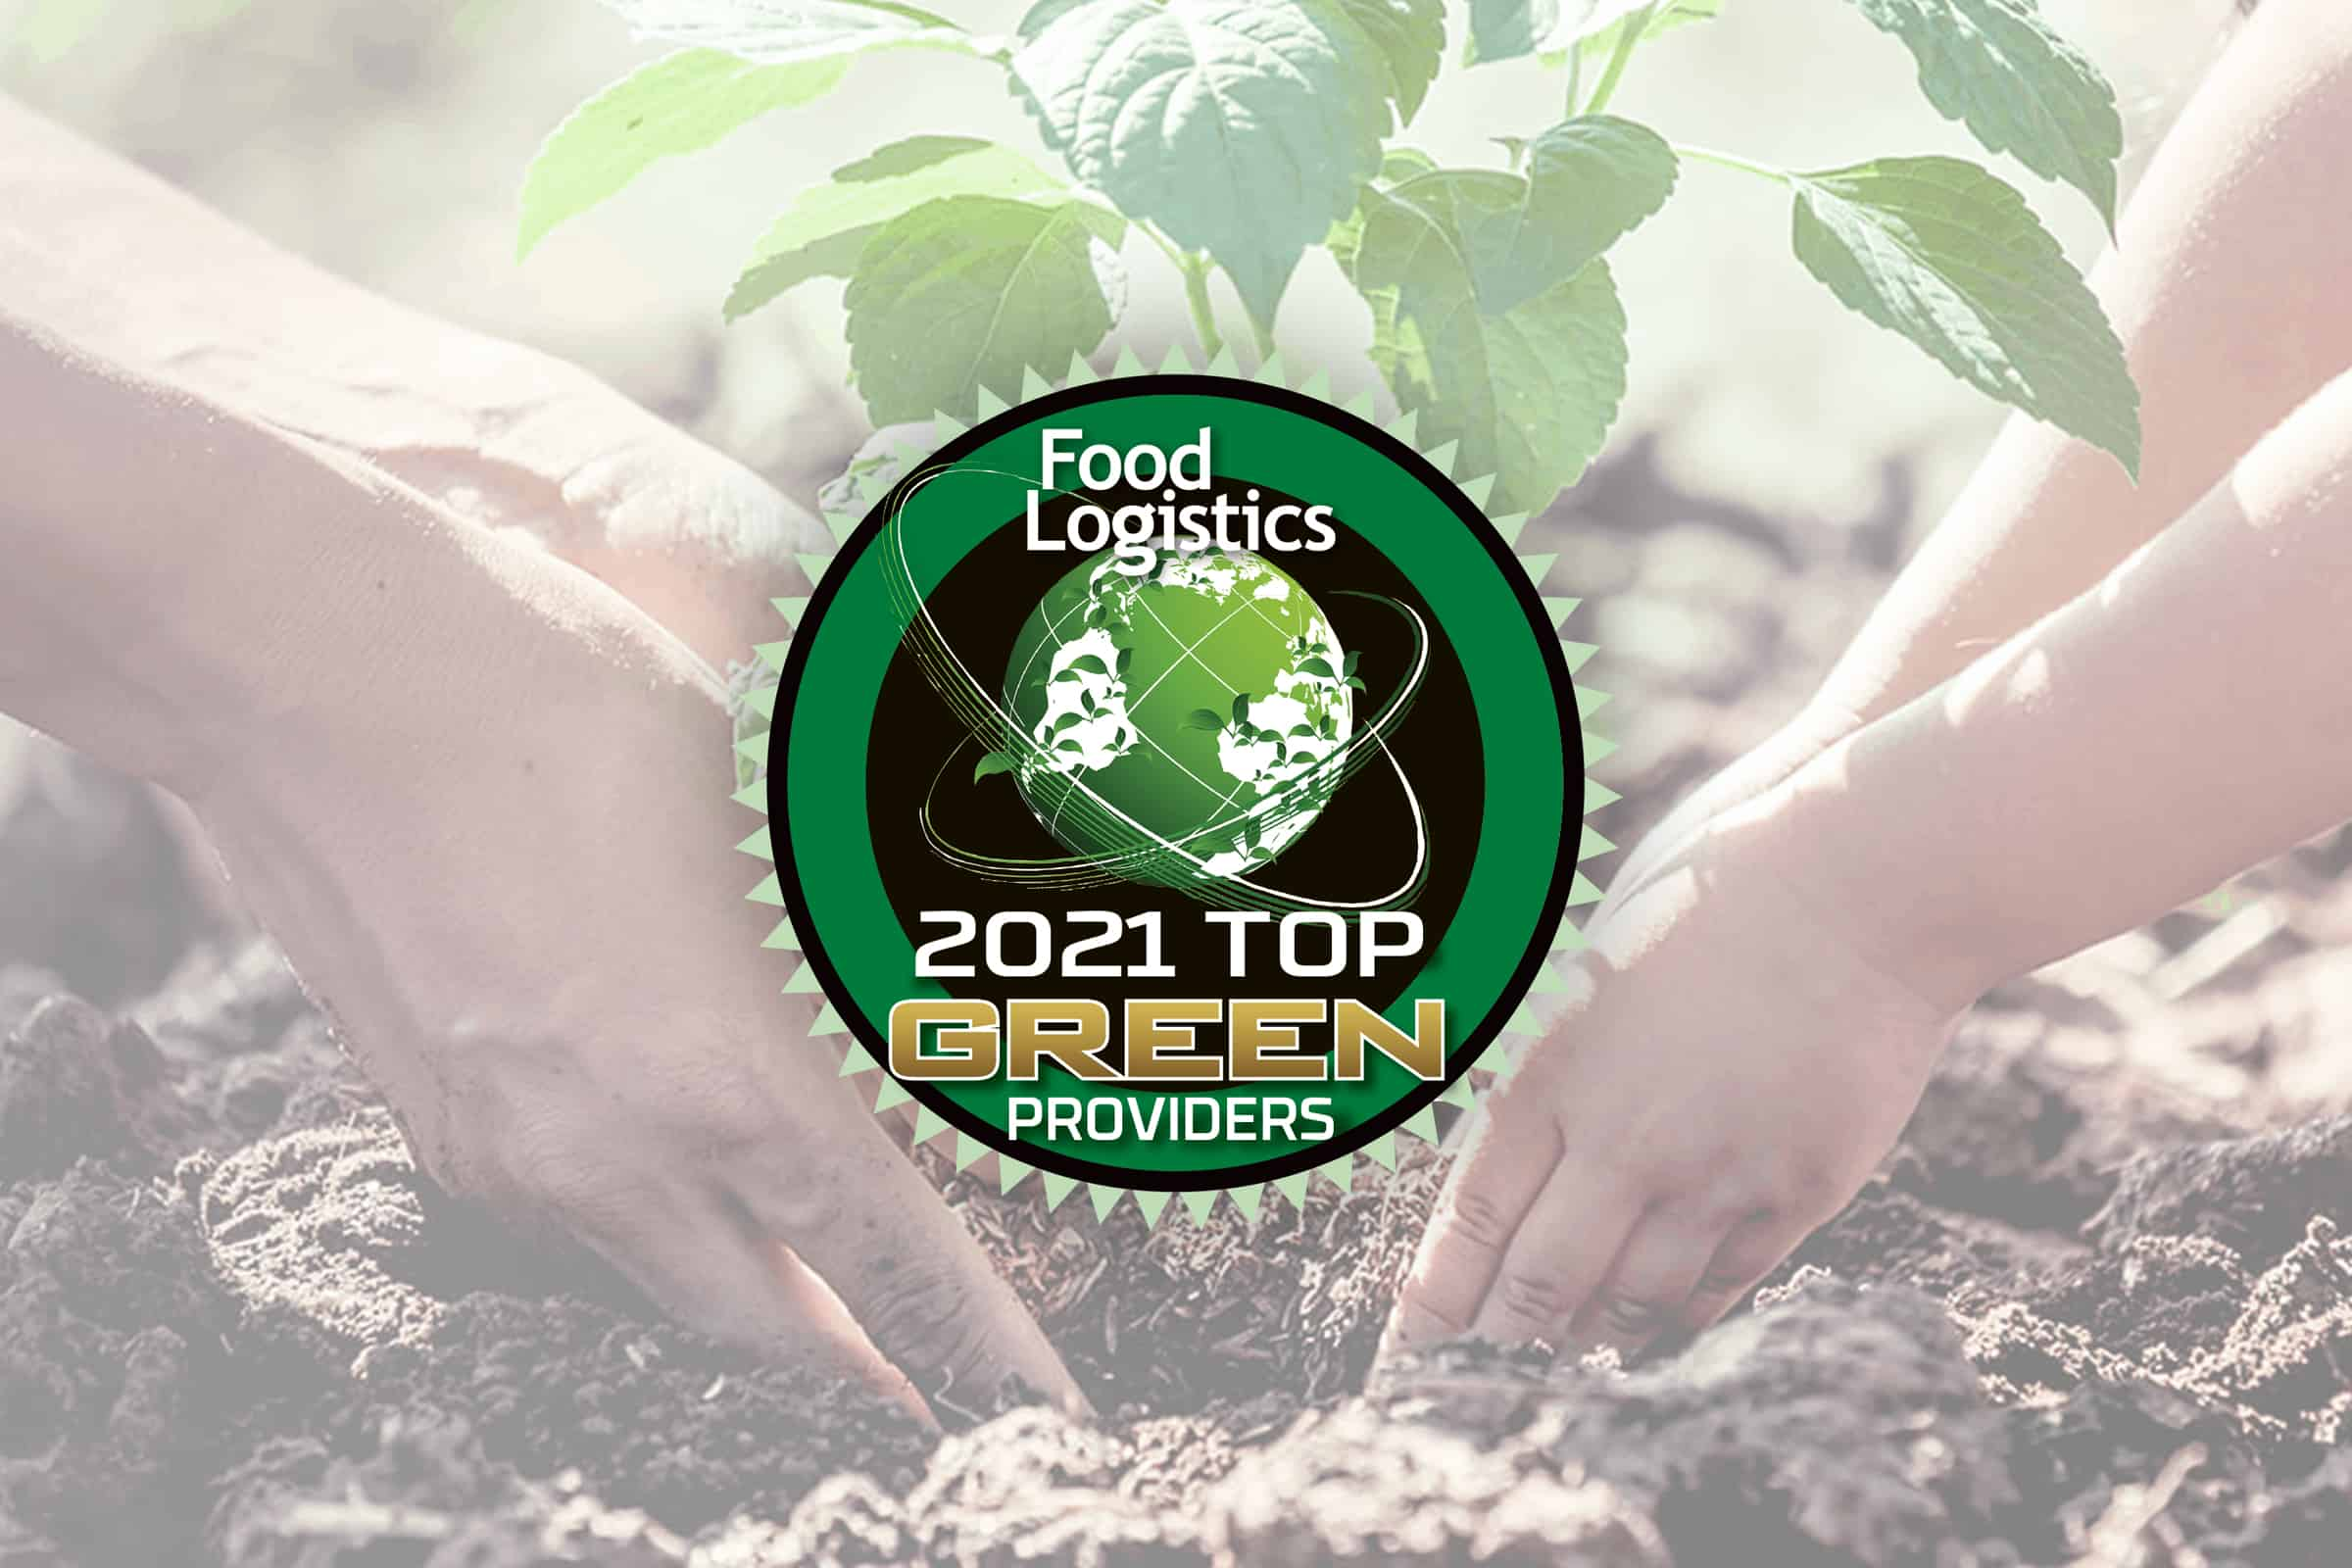 top green provider, cj logistics america, cj logistics, supply chain sustainability